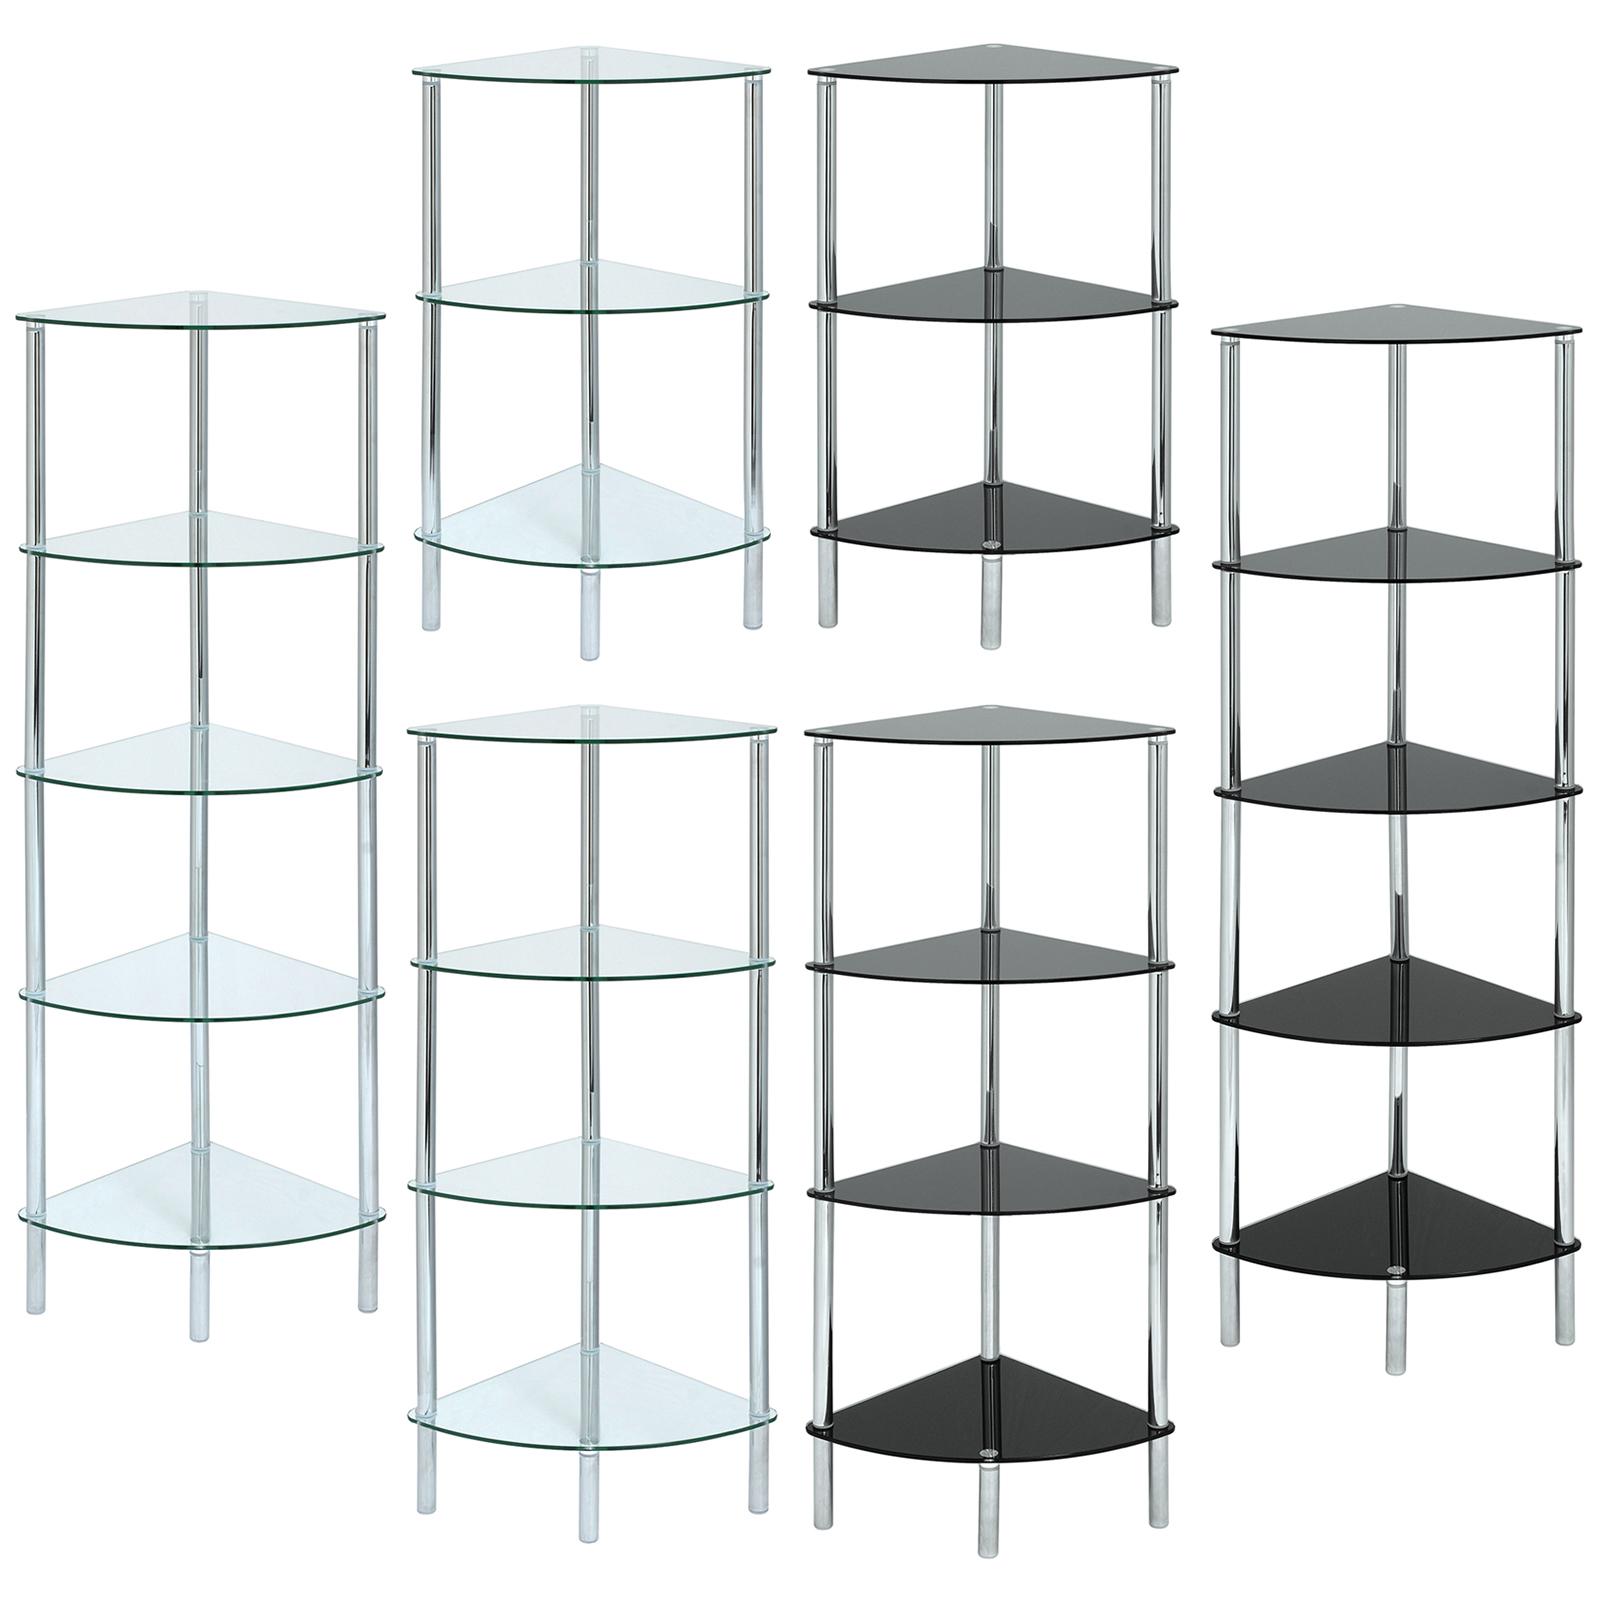 GLASS CORNER SHELF UNIT DISPLAY/BATHROOM/HALL/END/LAMP